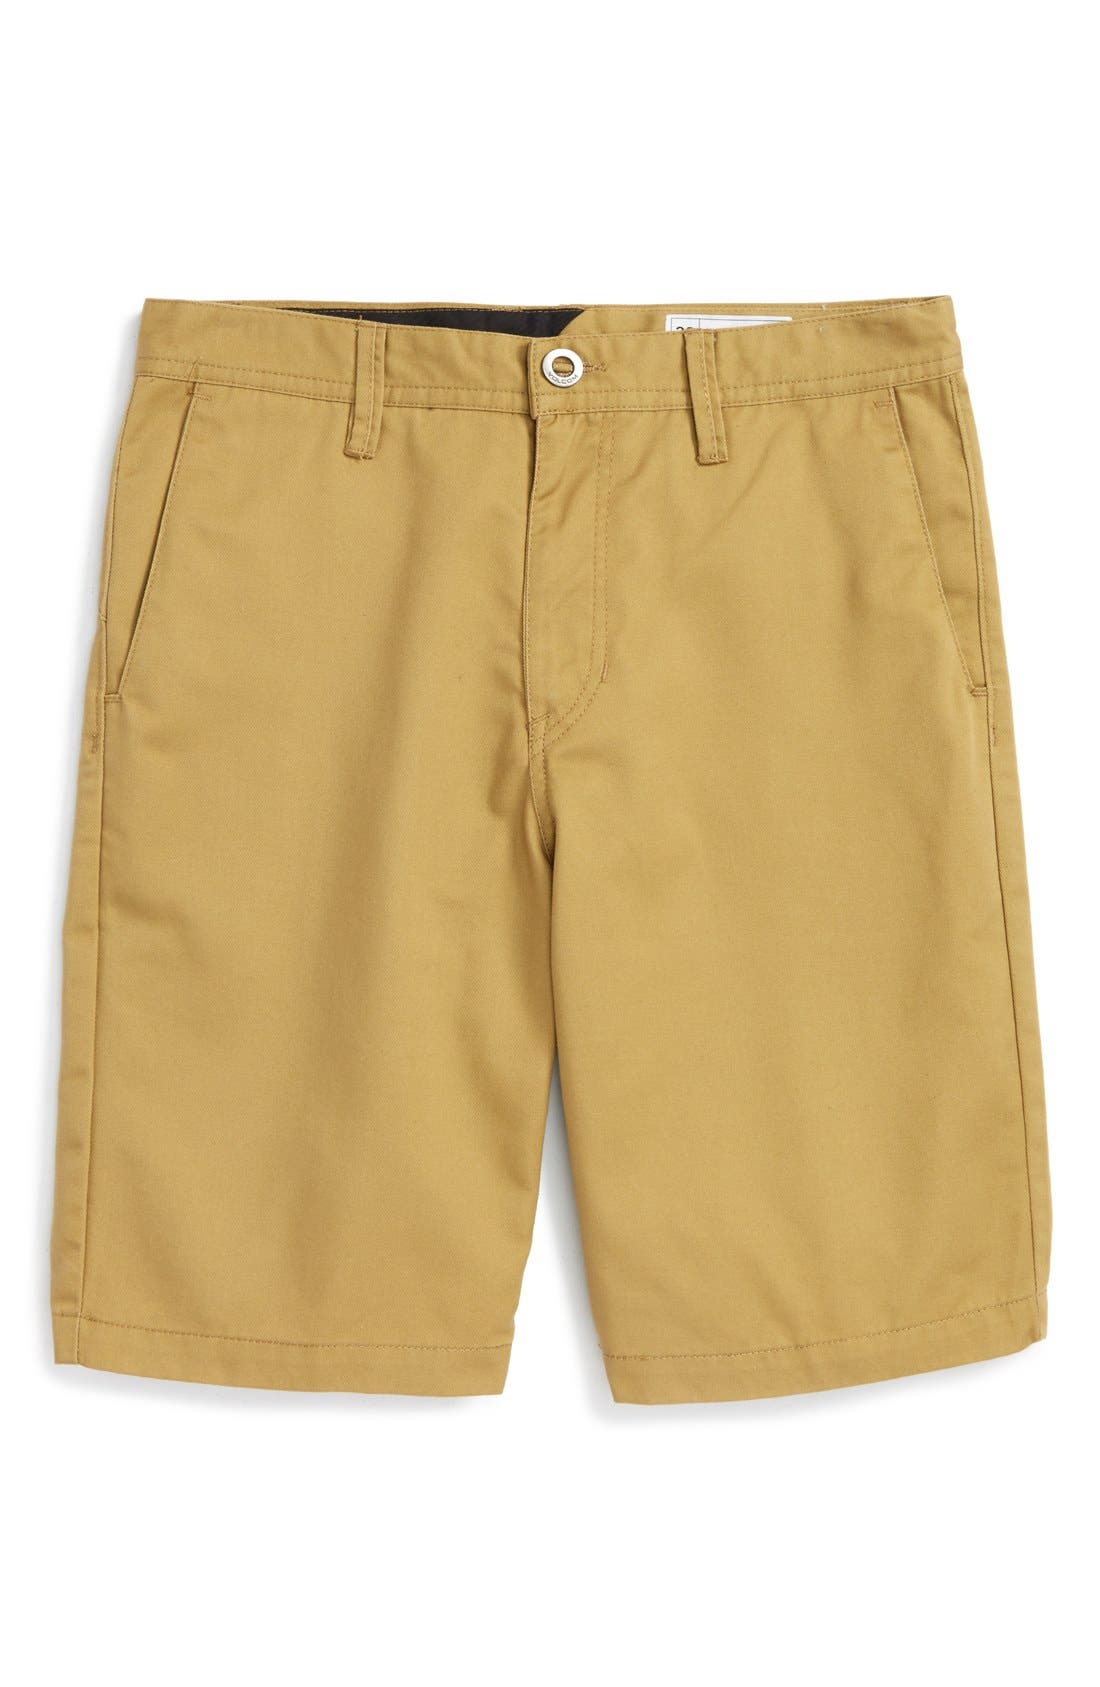 Boys Volcom Chino Shorts